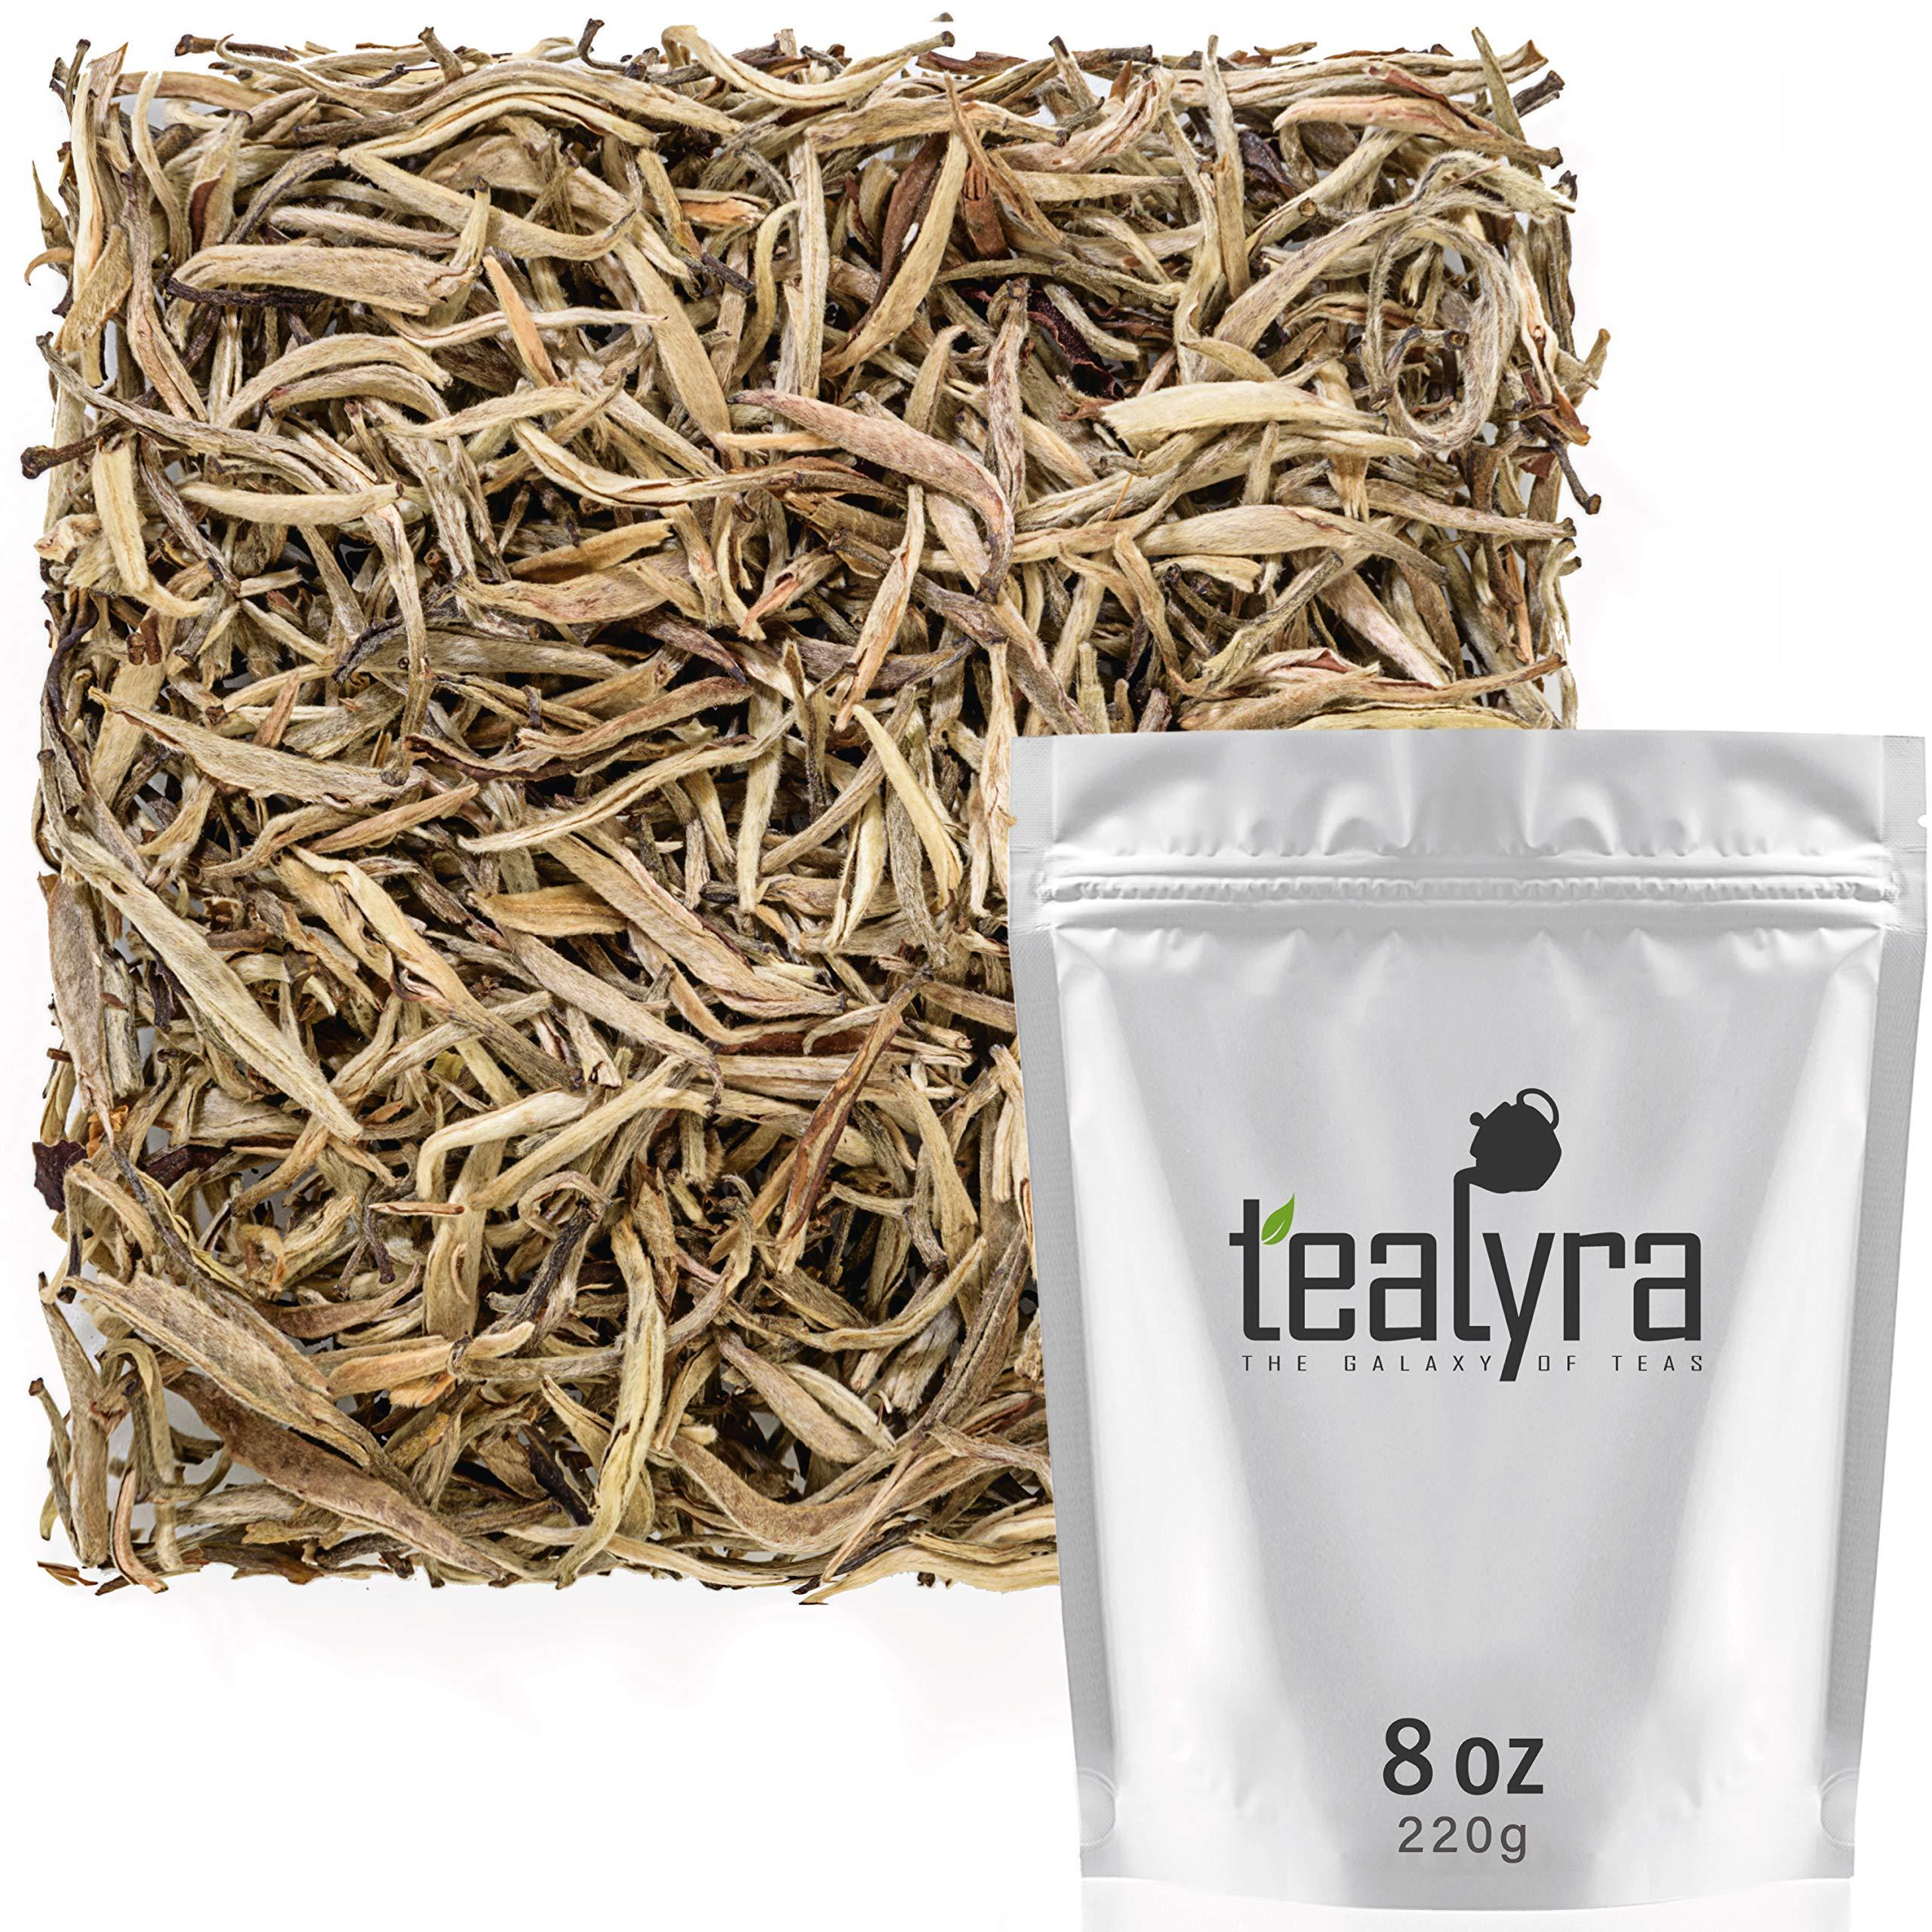 Tealyra - Luxury Jasmine Silver Needle White Losse Tea - Organically Grown in Fujian China - Loose Leaf Tea - Caffeine Level Low - 220g (8-ounce)